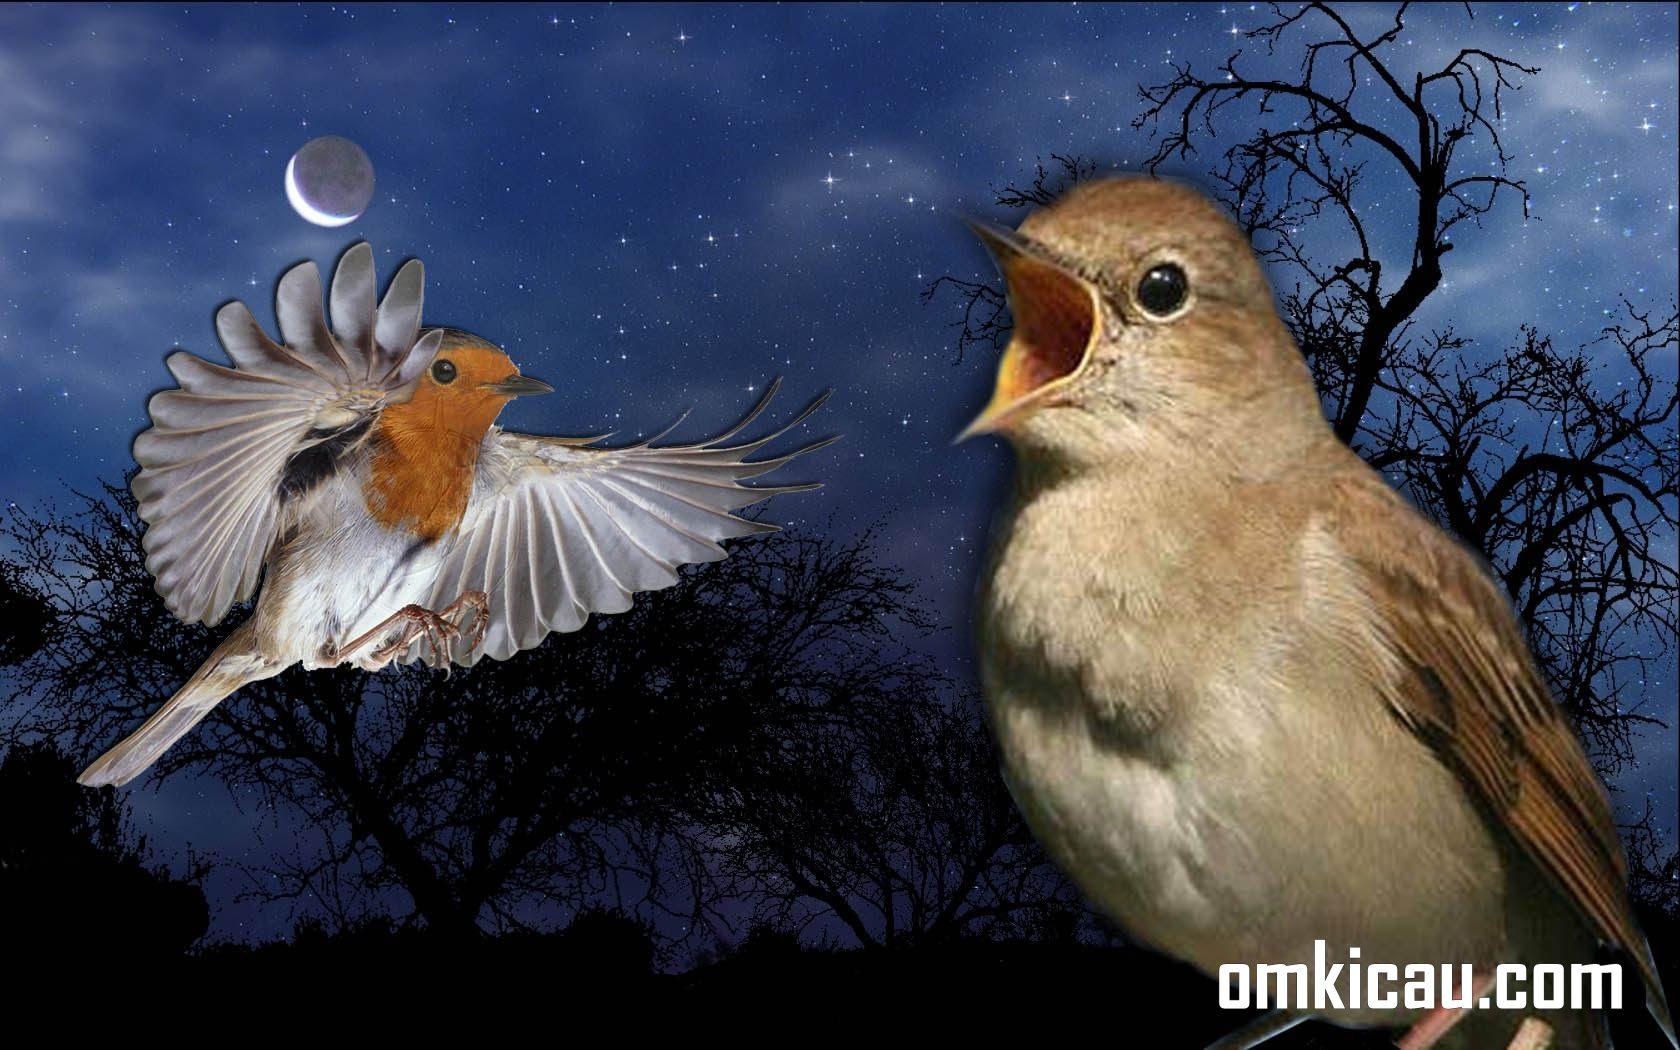 Selain nightingale, ada beberapa jenis burung yang juga aktif berkicau pada malam hari dengan suara merdunya